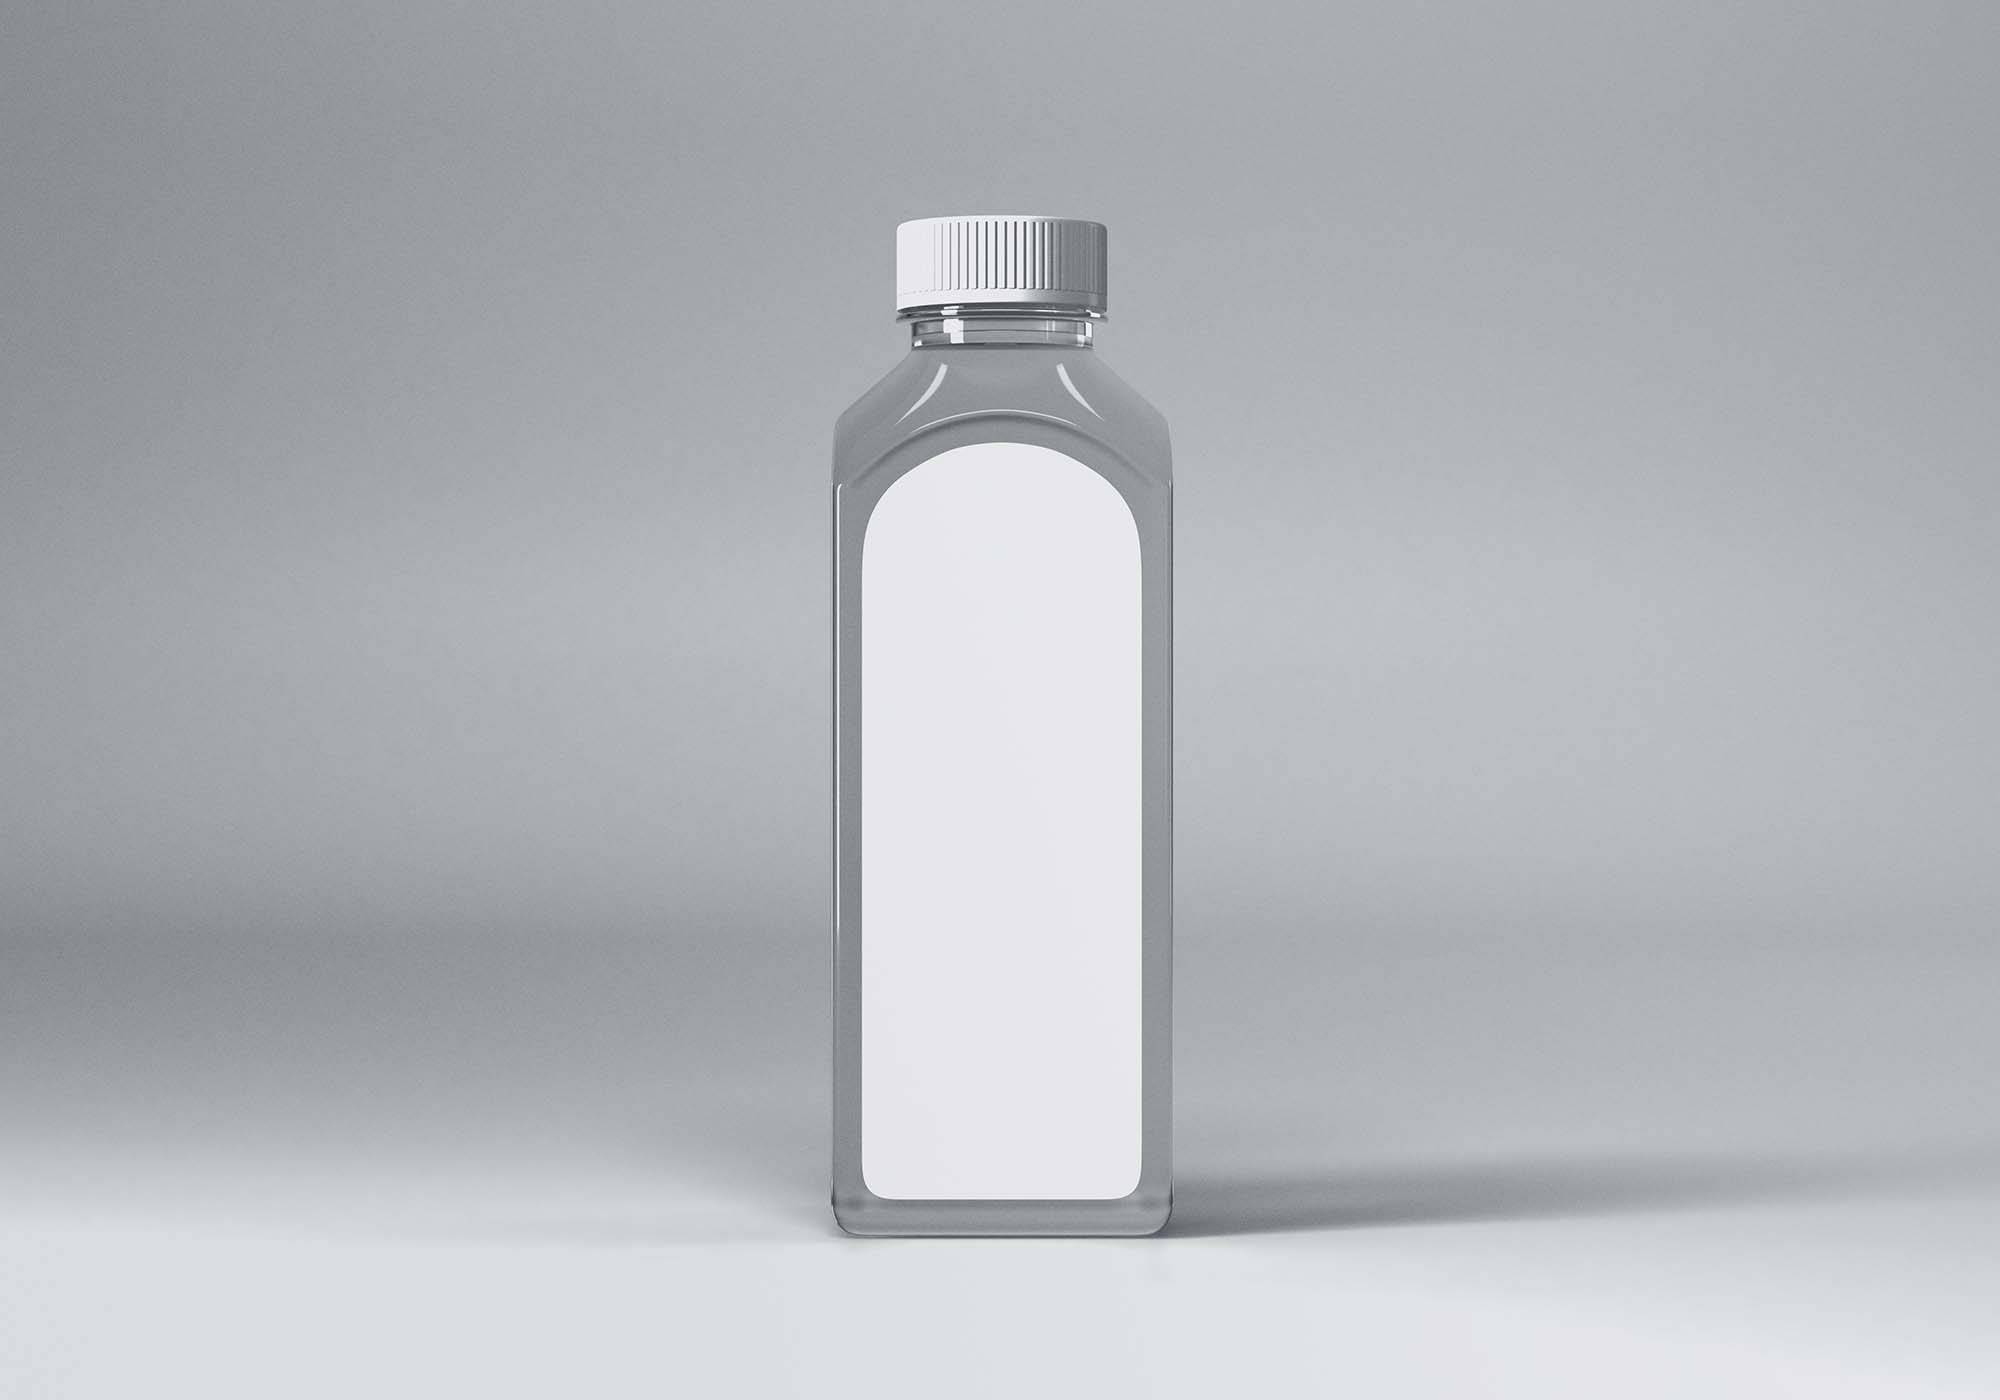 Transparent Small Plastic Bottle Mockup 2